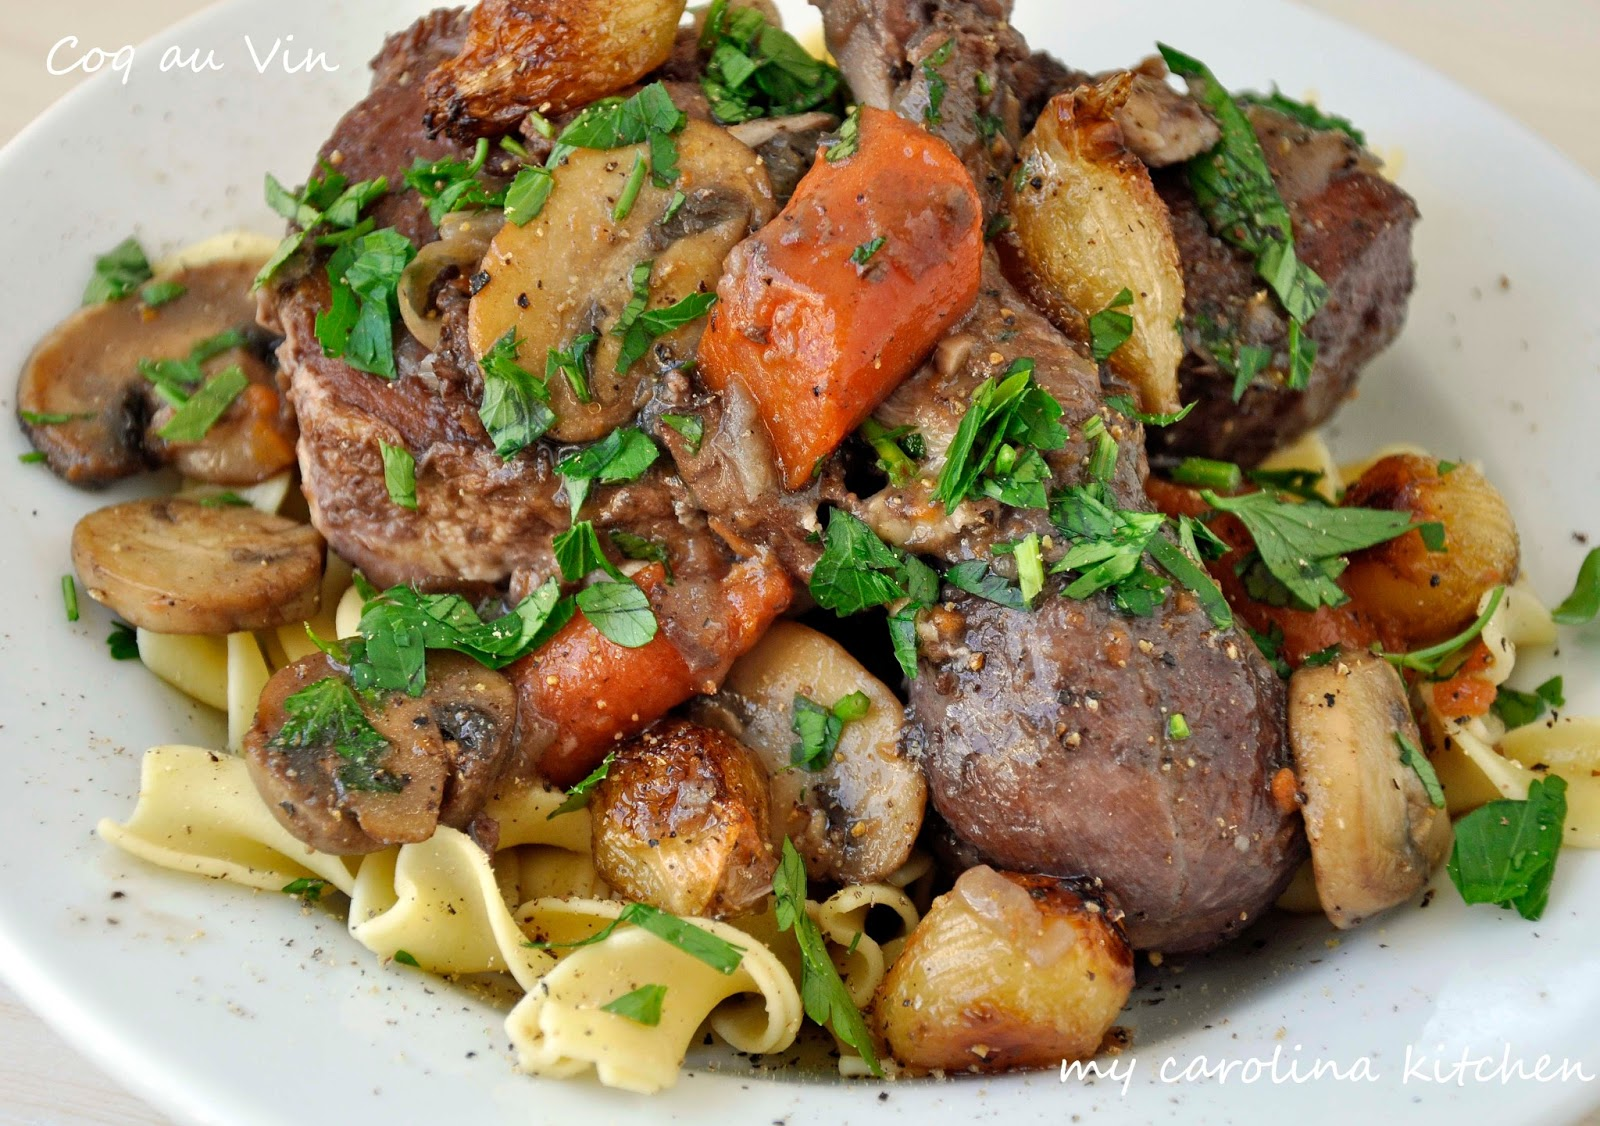 Beef Stew Ina Garten my carolina kitchen: ina's coq au vin – it's just beef bourguignon